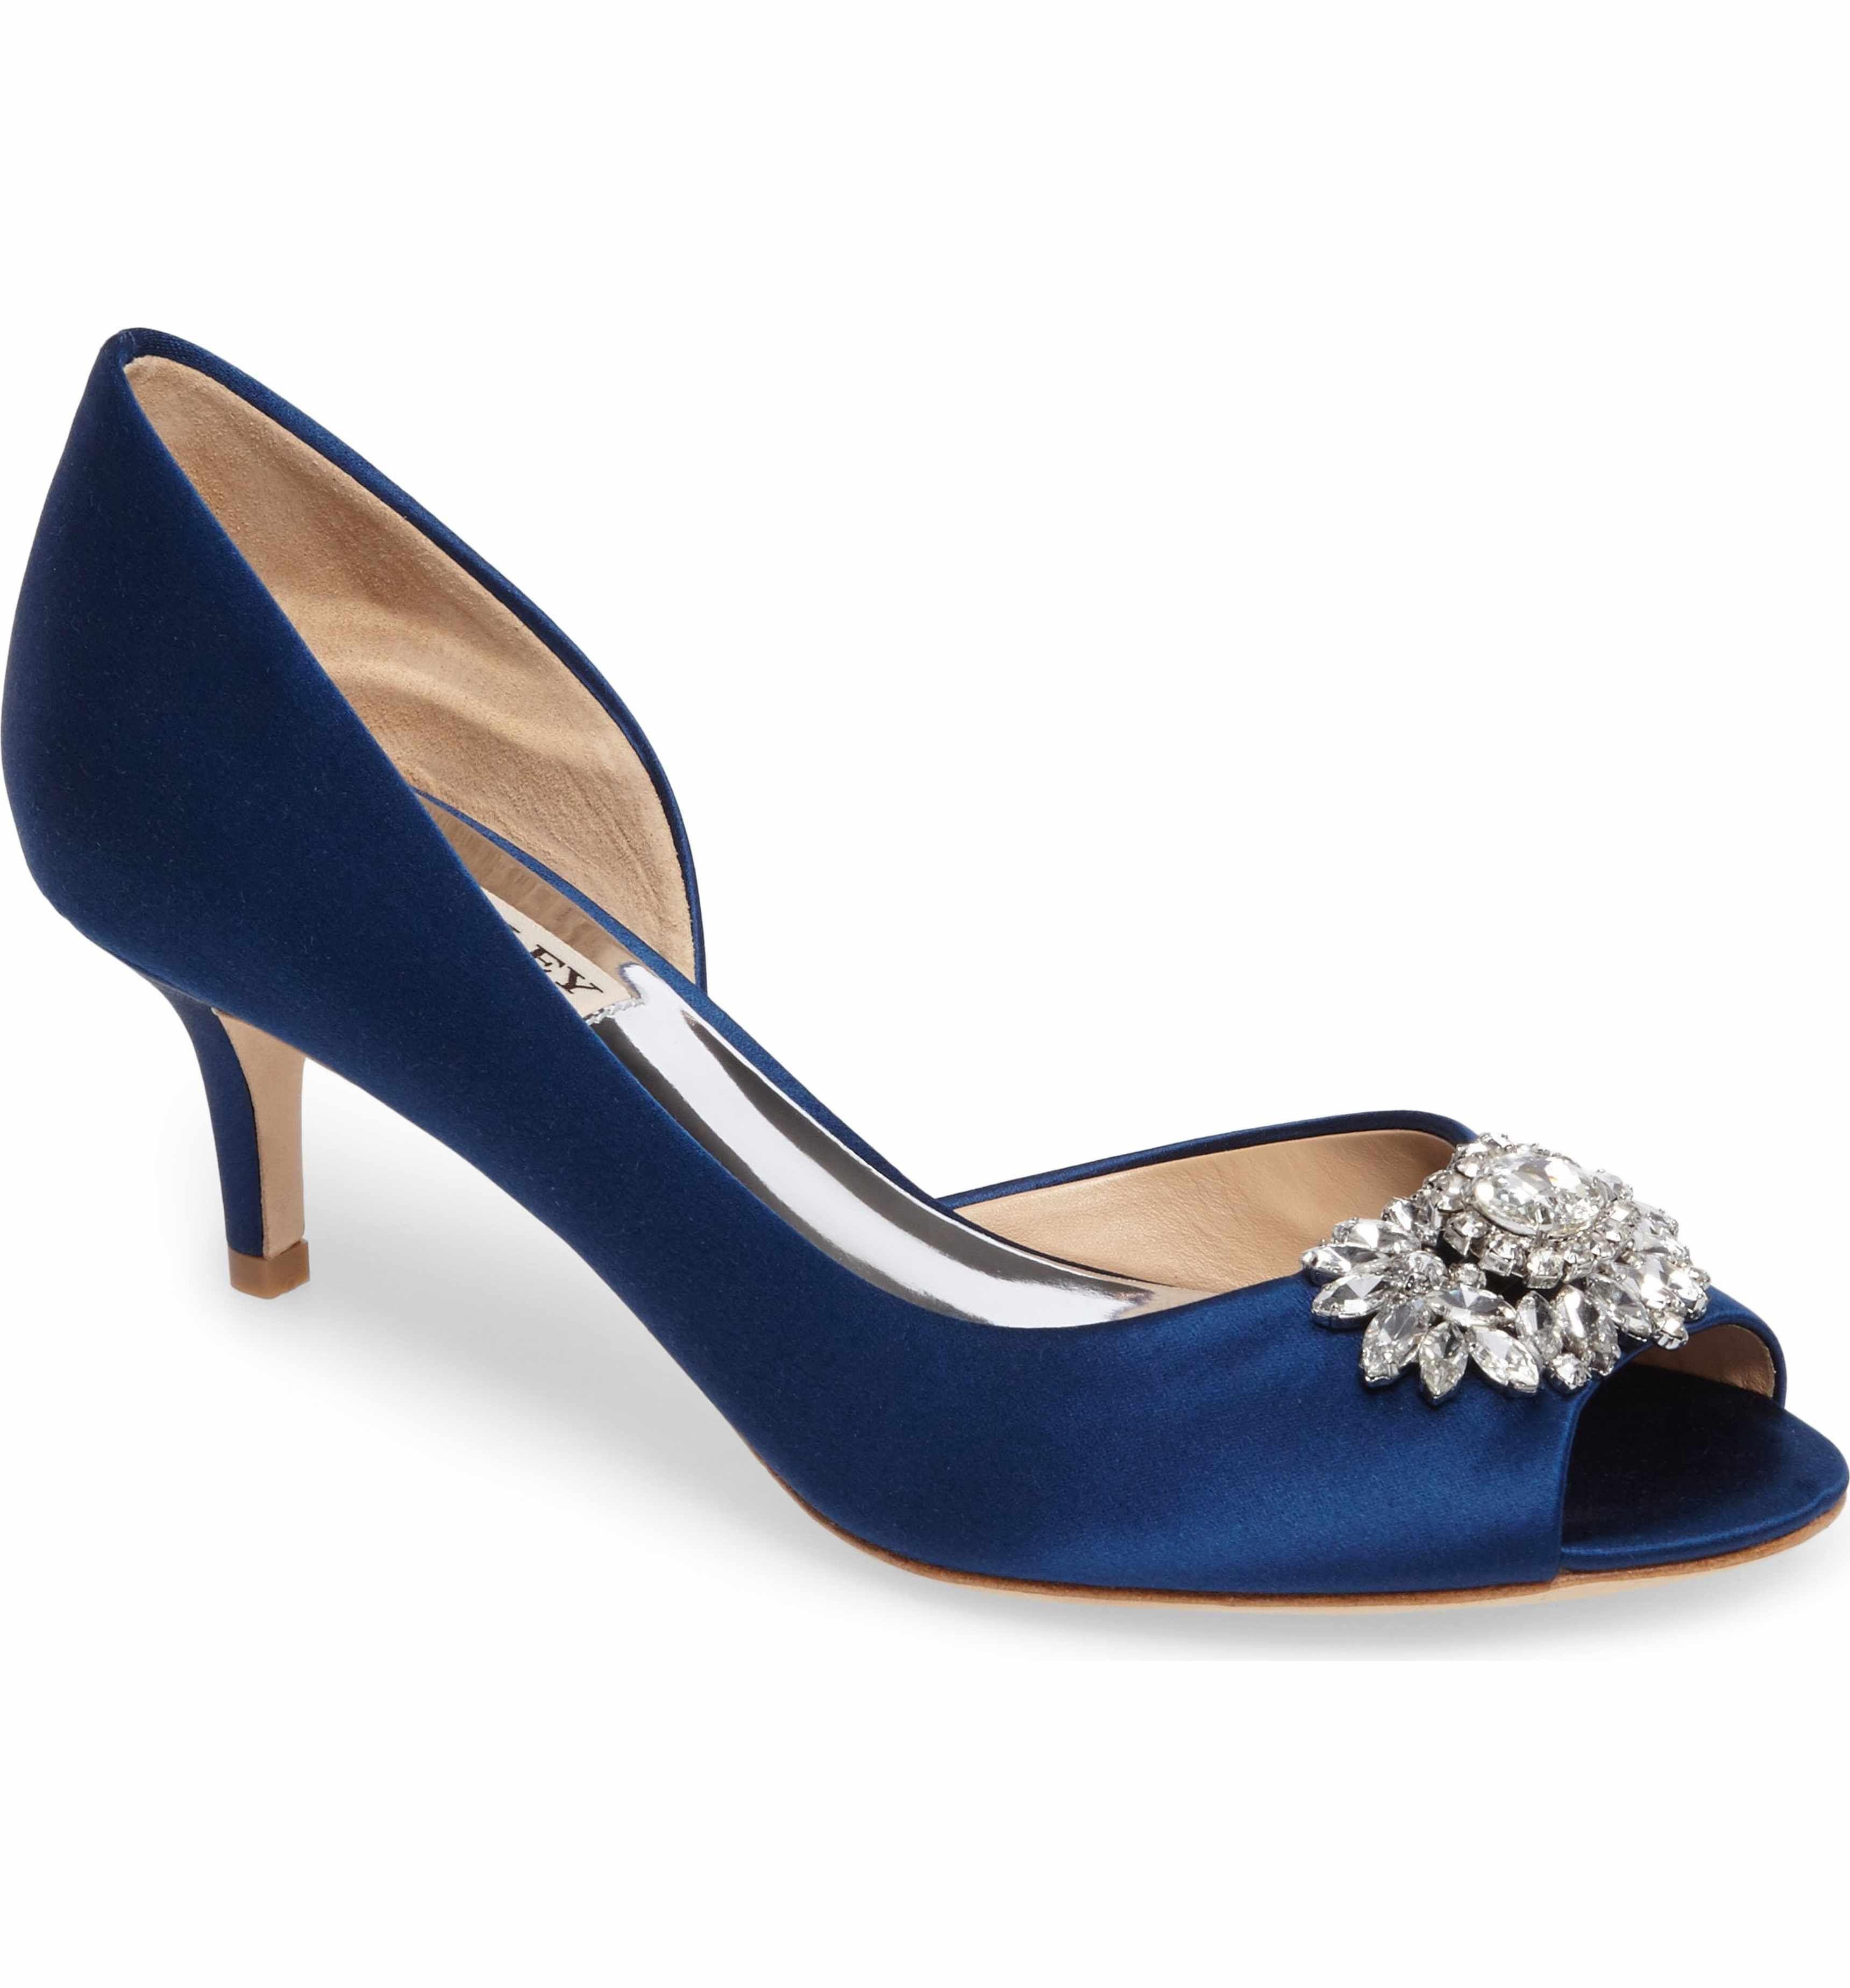 Bridal Shoes At Nordstrom: Badgley Mischka Macie Peep Toe D-Orsay Pump (Women